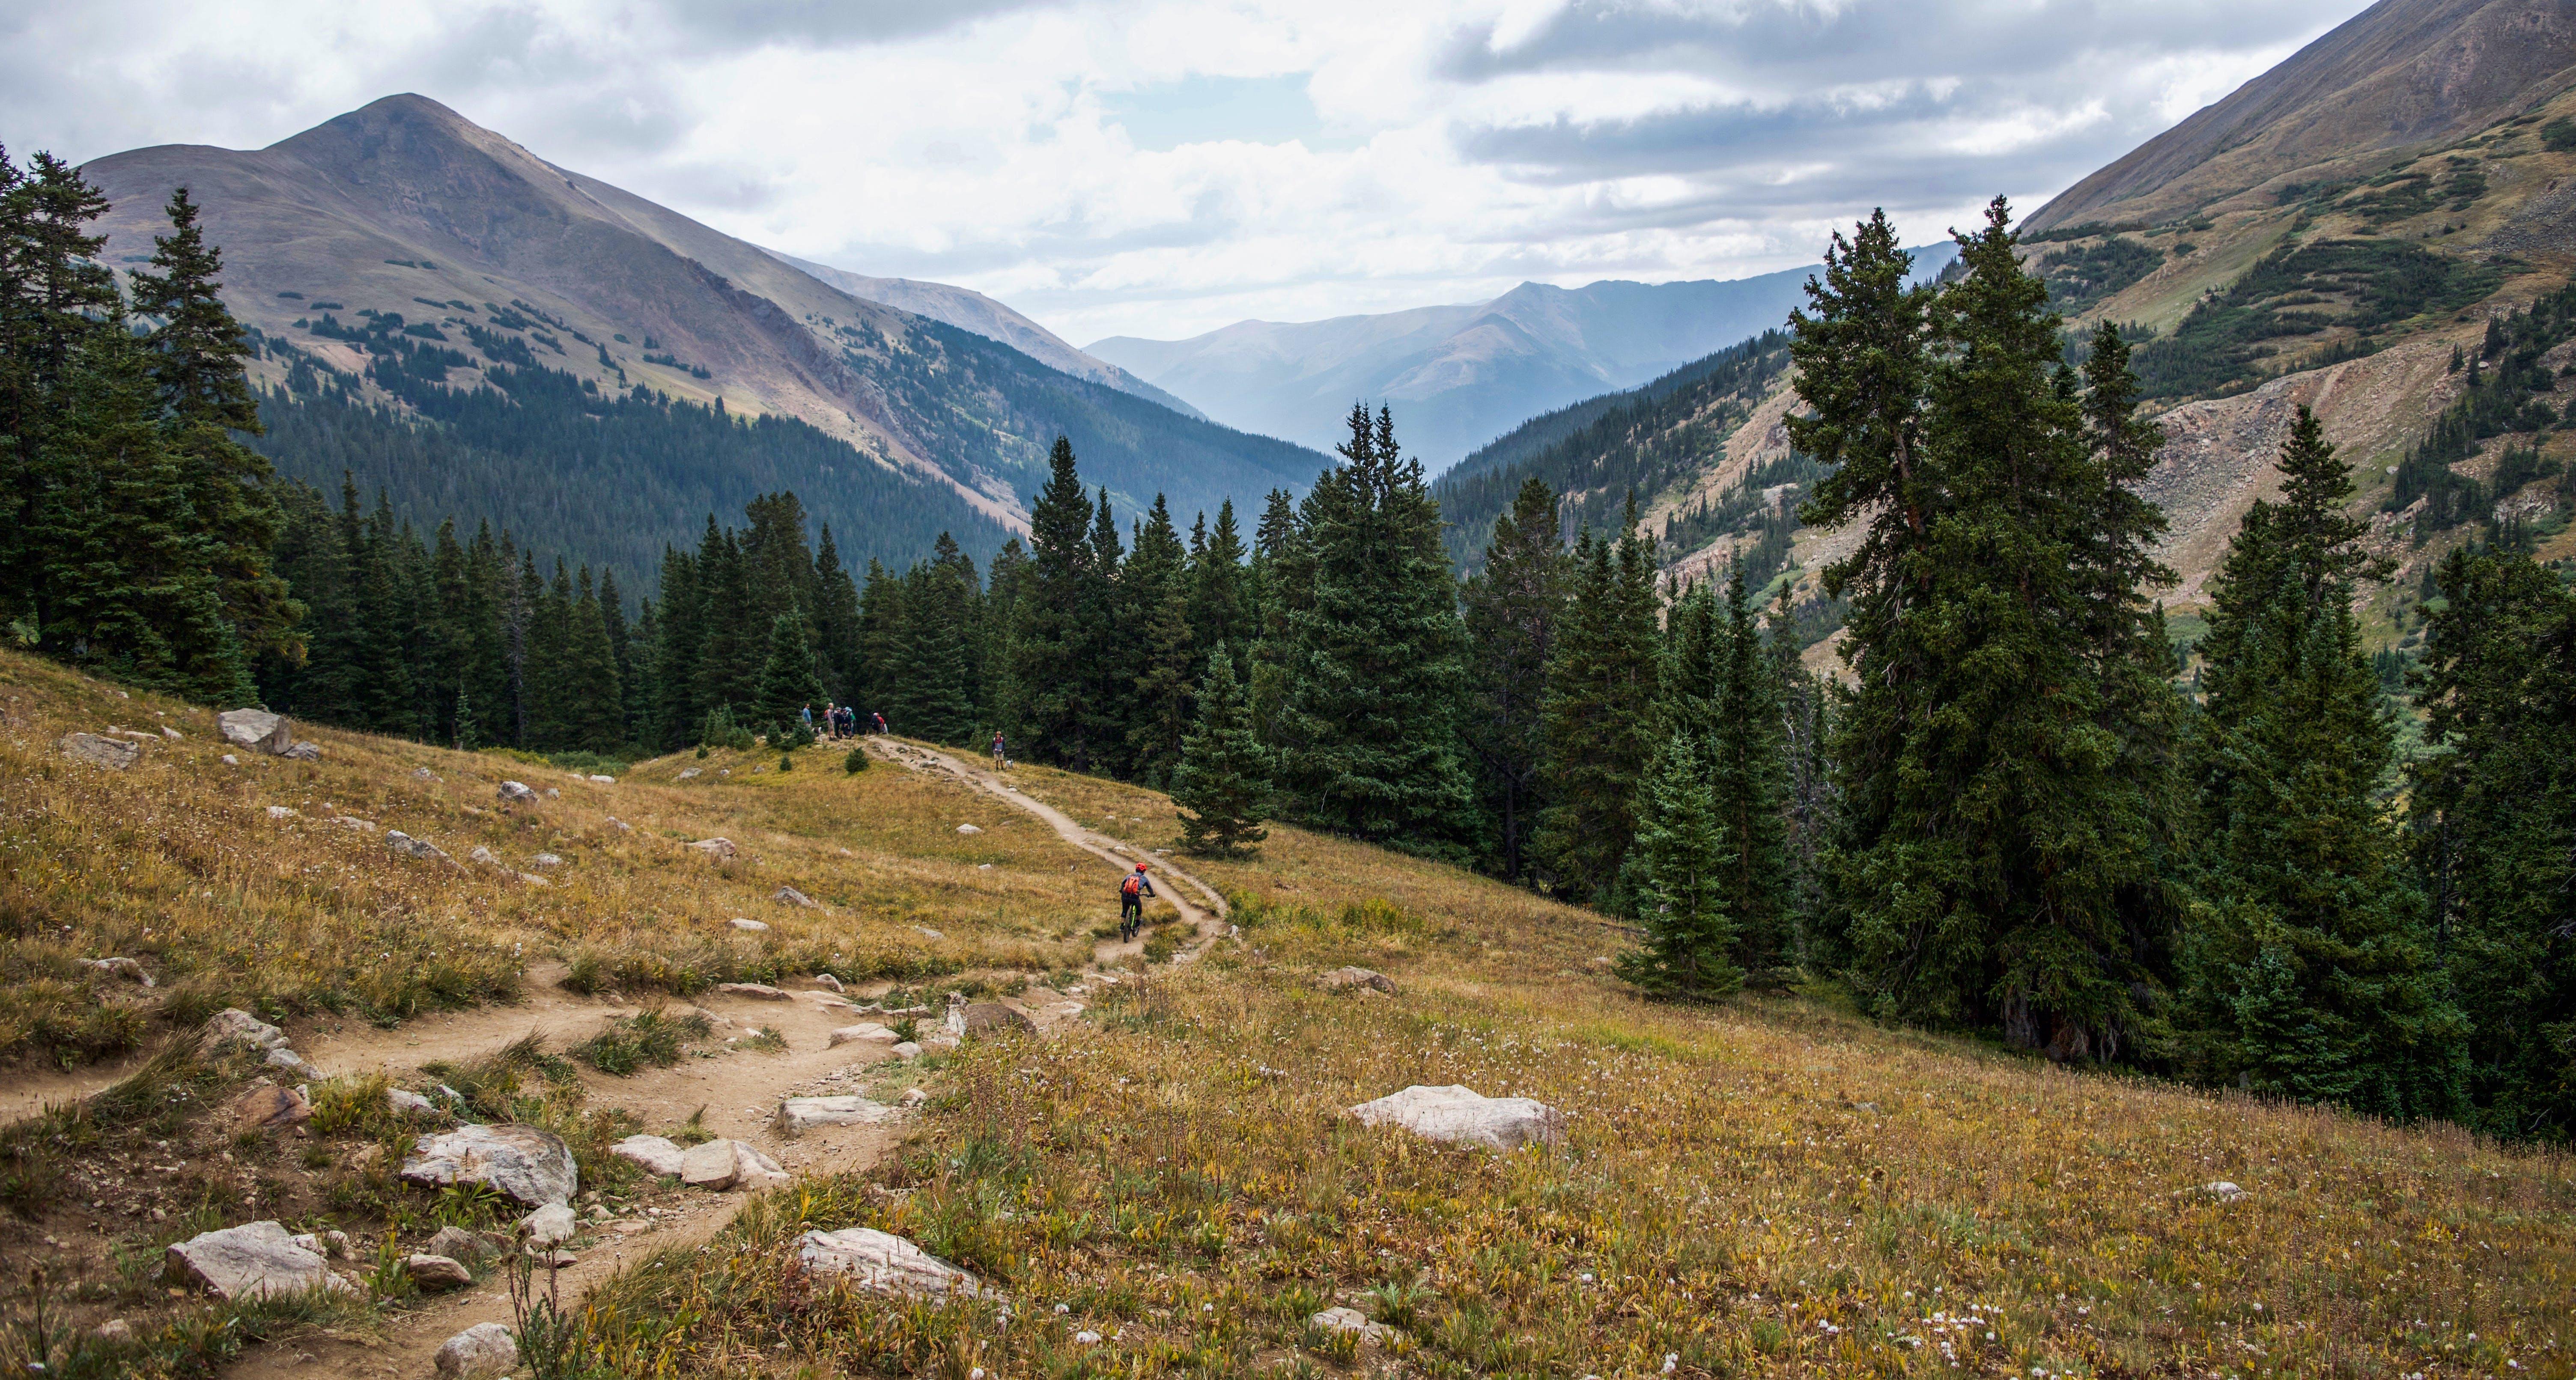 Kostenloses Stock Foto zu abenteuer, alpin, bäume, berg